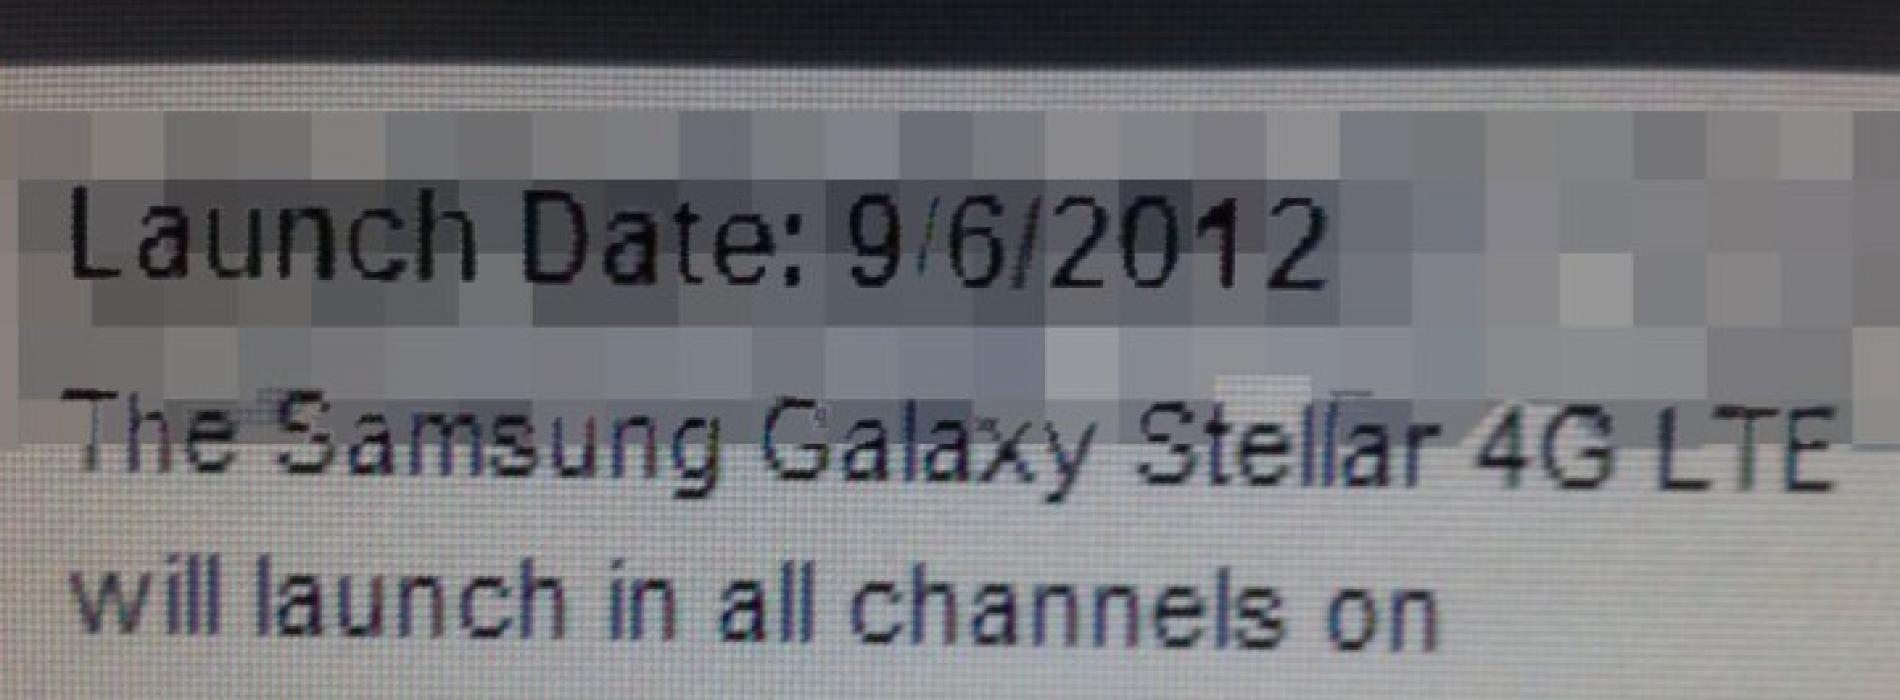 Verizon's Samsung Galaxy Stellar looks good for September 6 debut